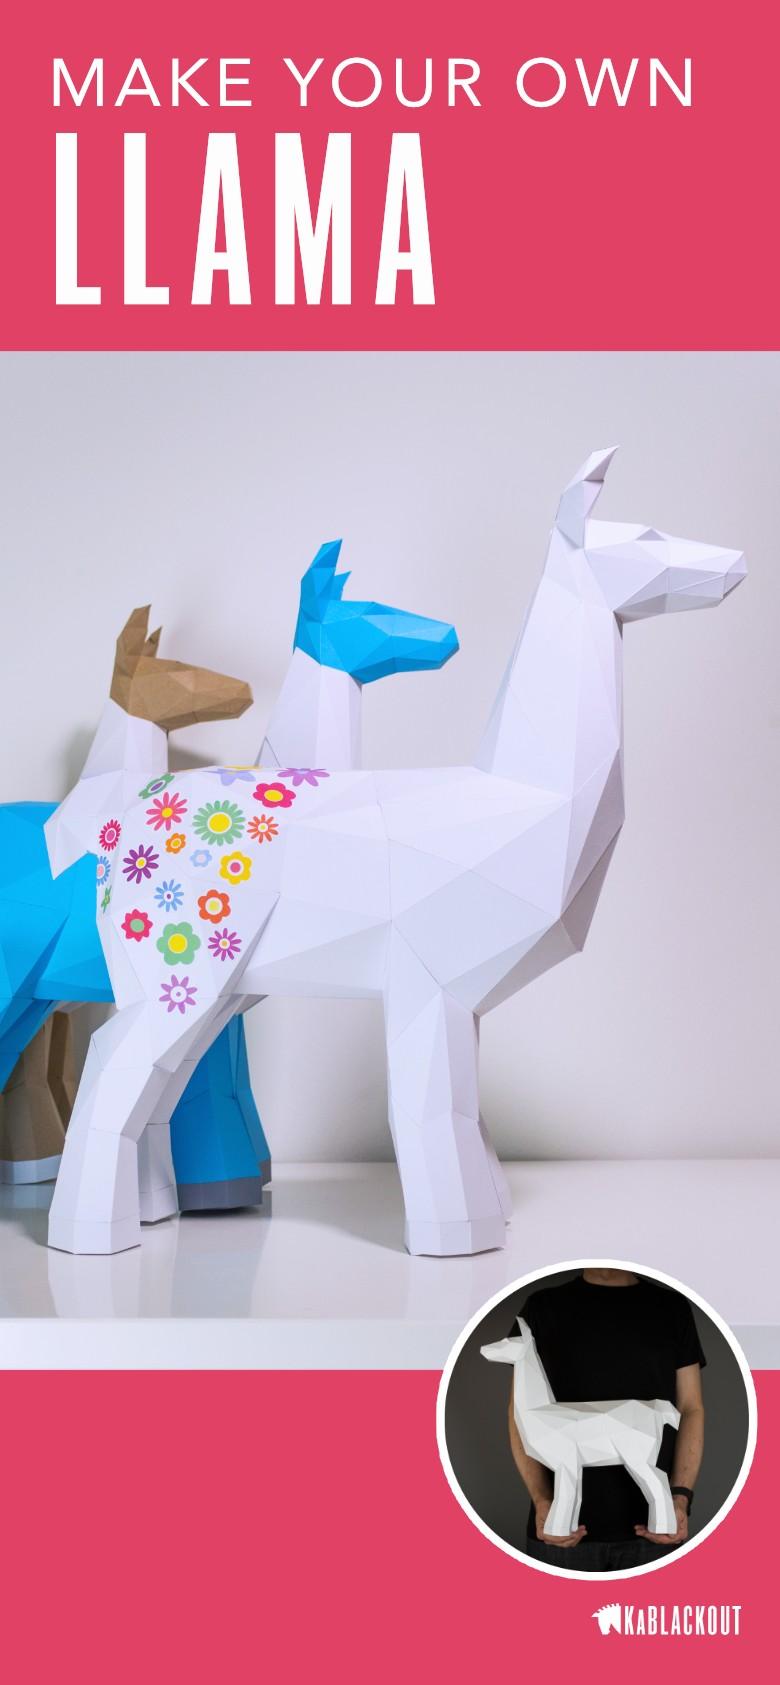 Kirby Papercraft Llama Papercraft Low Poly Llama Paper Llama Craft Llama Lover